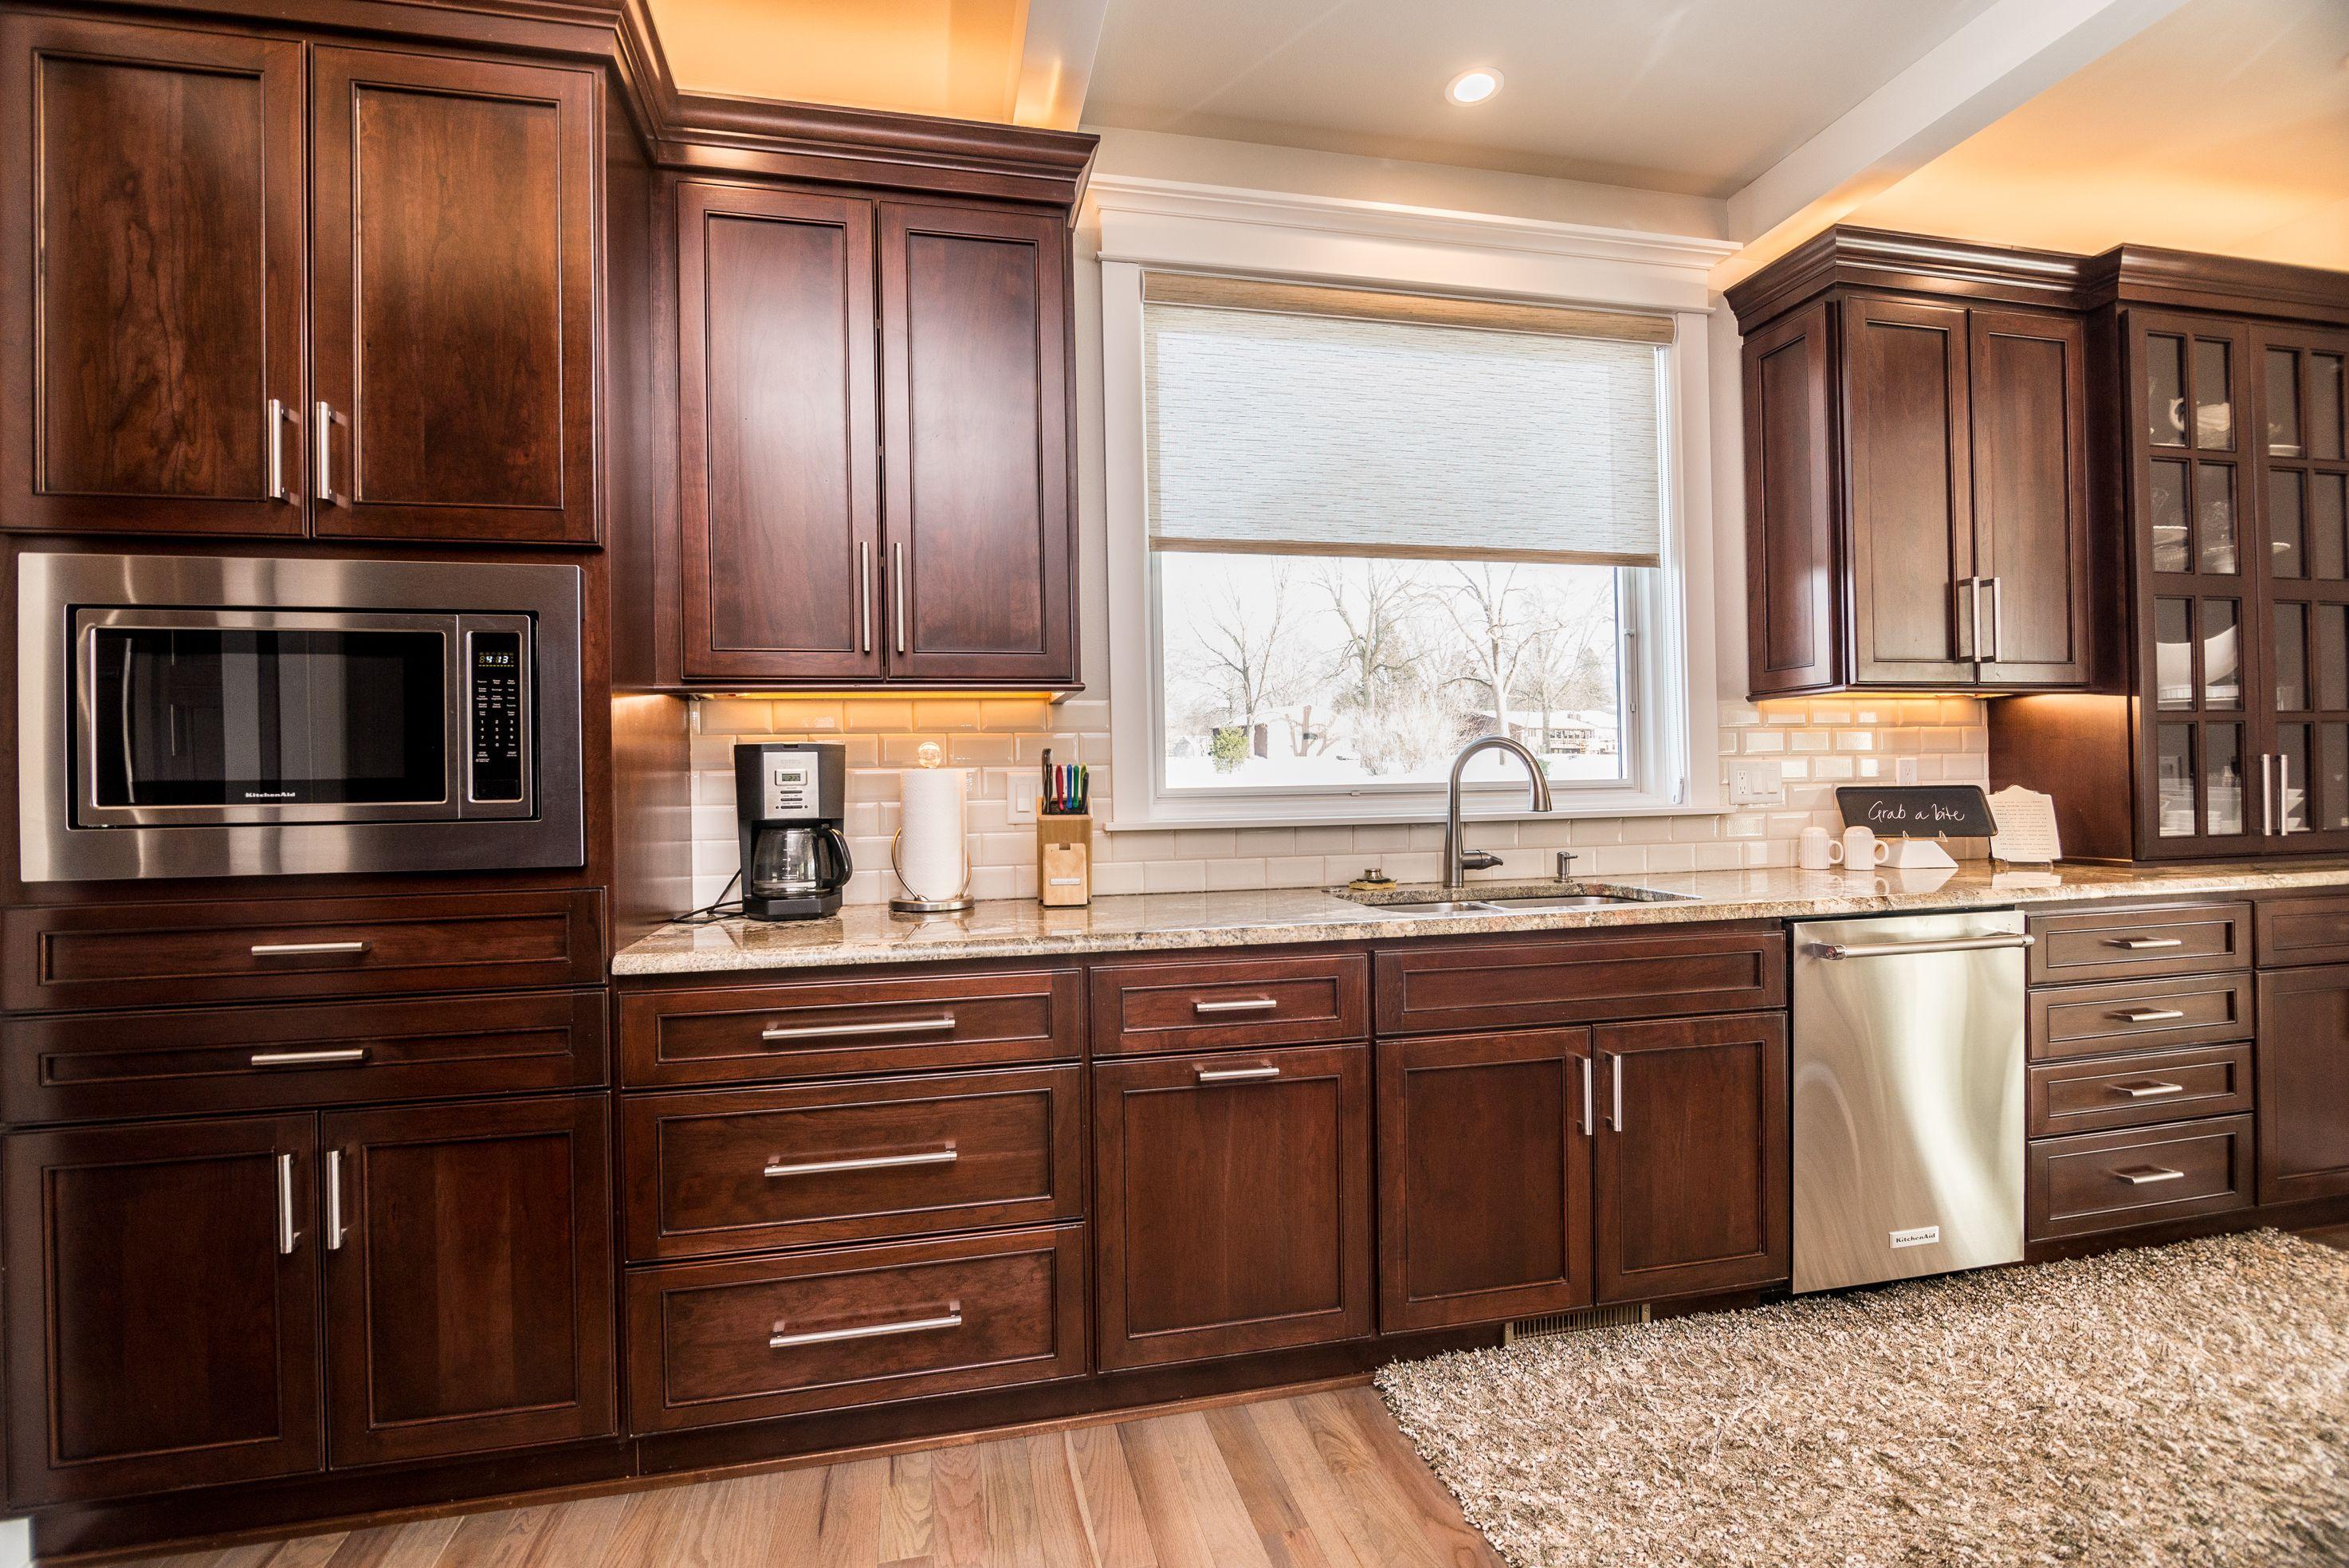 Bellahomesiowa Kitchen Kitchen Remodel Home Kitchen